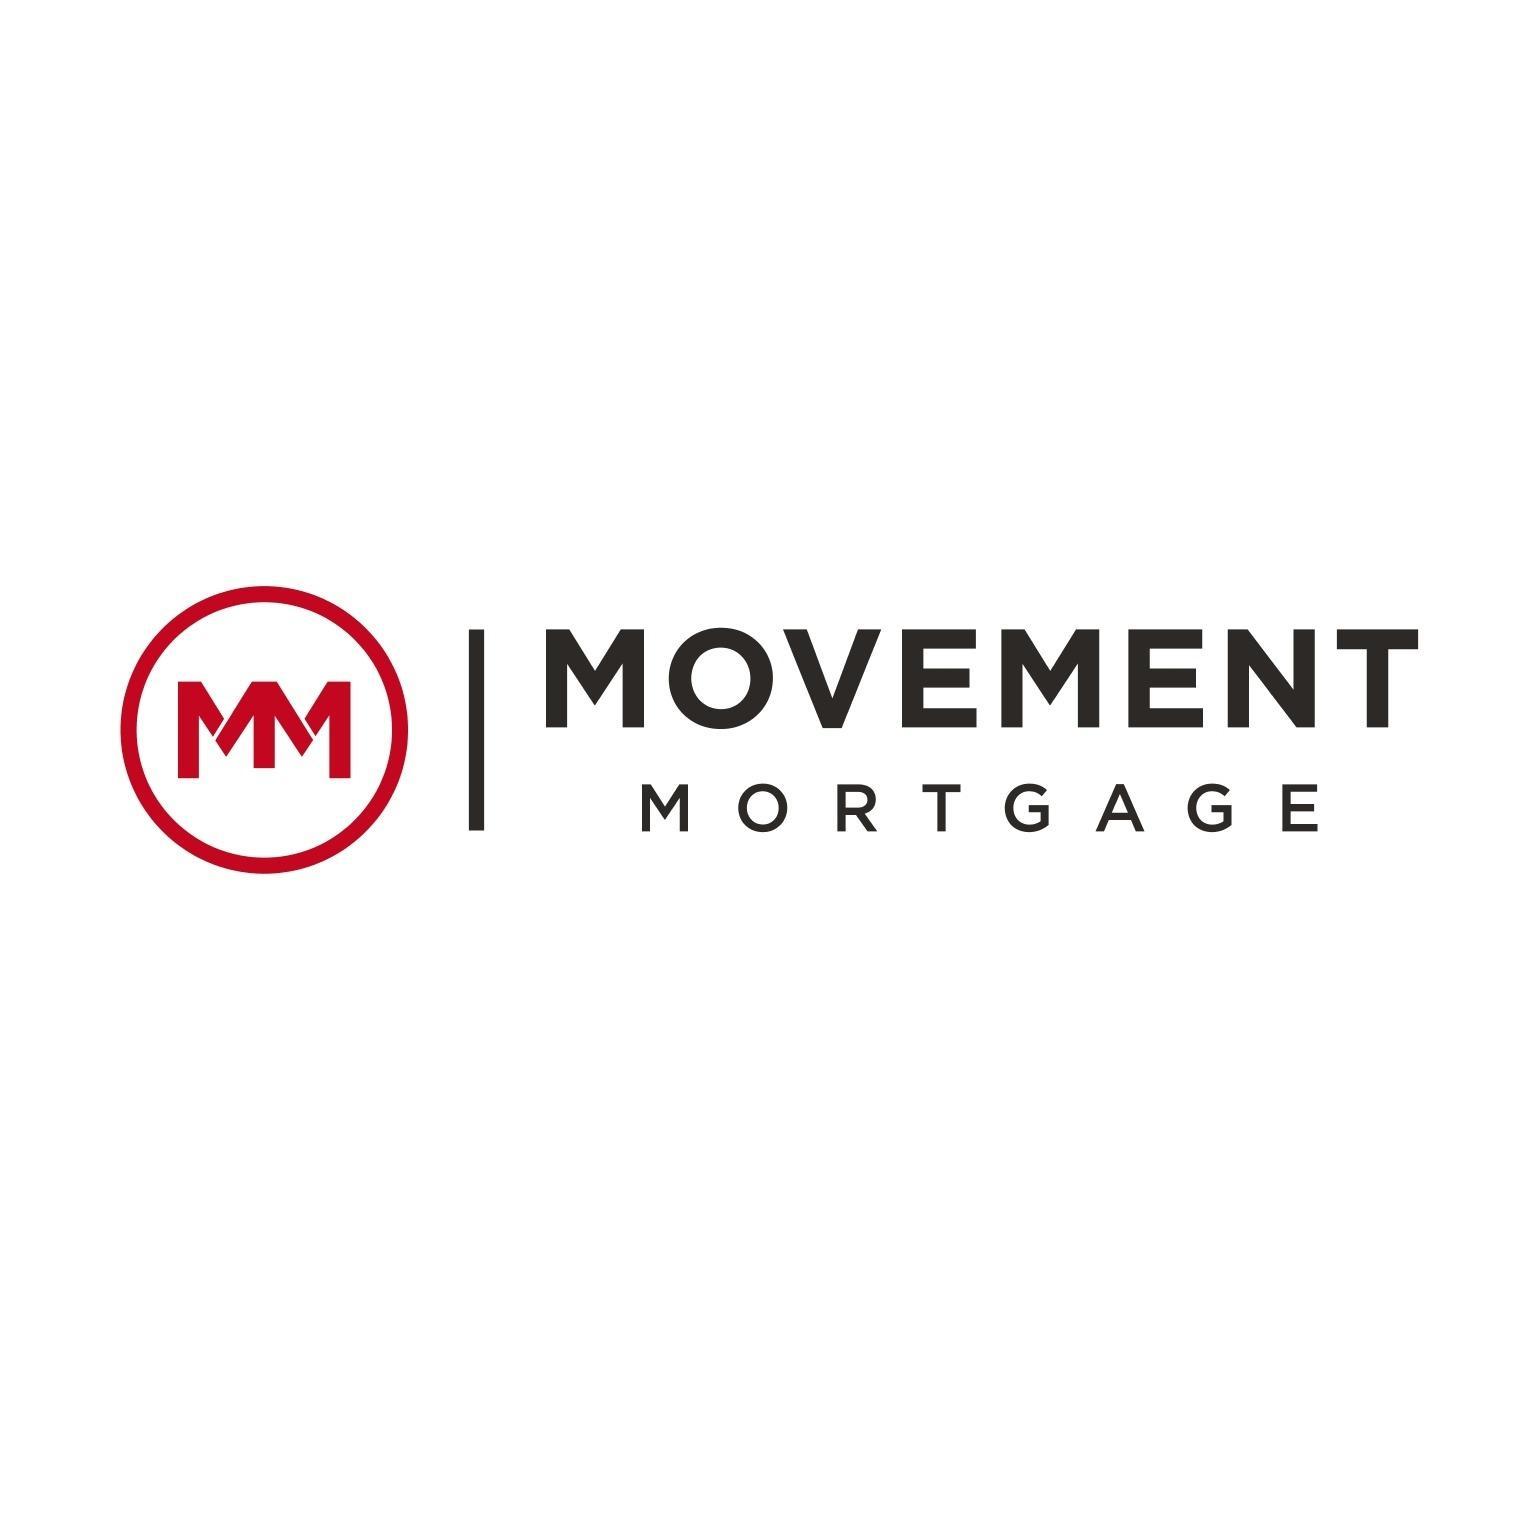 Matt Harris - Movement Mortgage - Harris Group